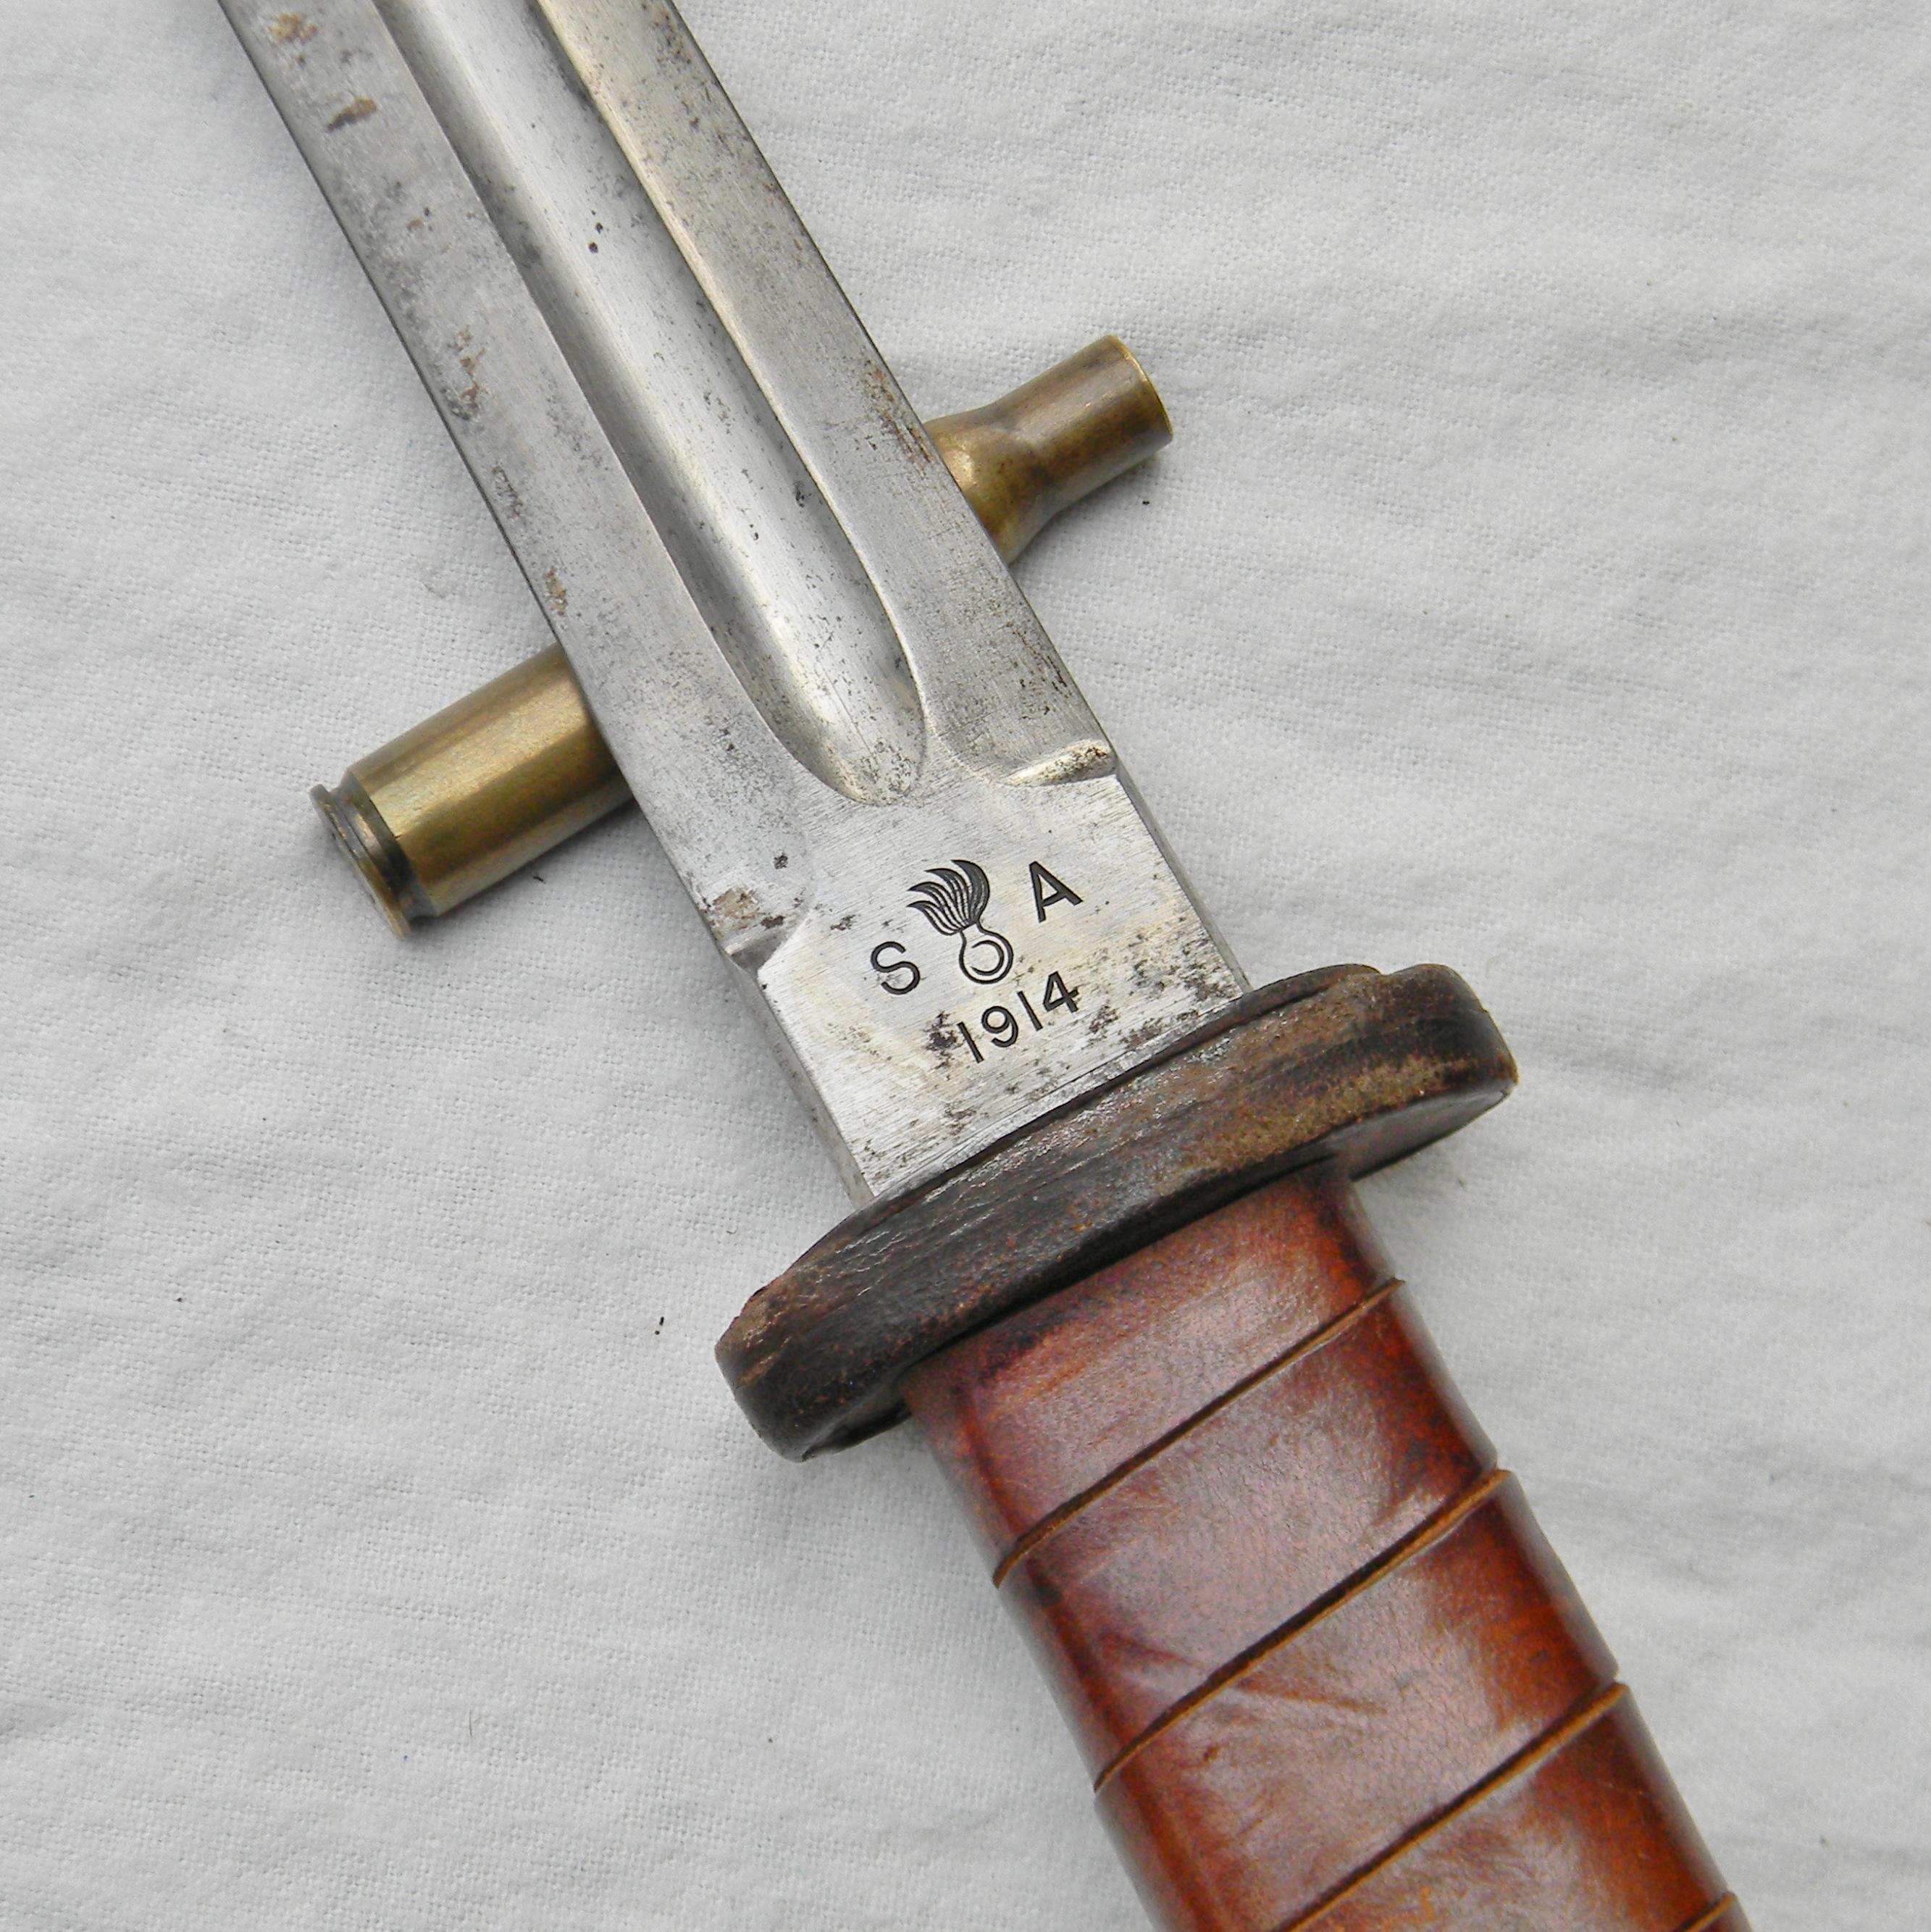 Ww2 American Fighting Knife Former Ww1 Patton Sword With